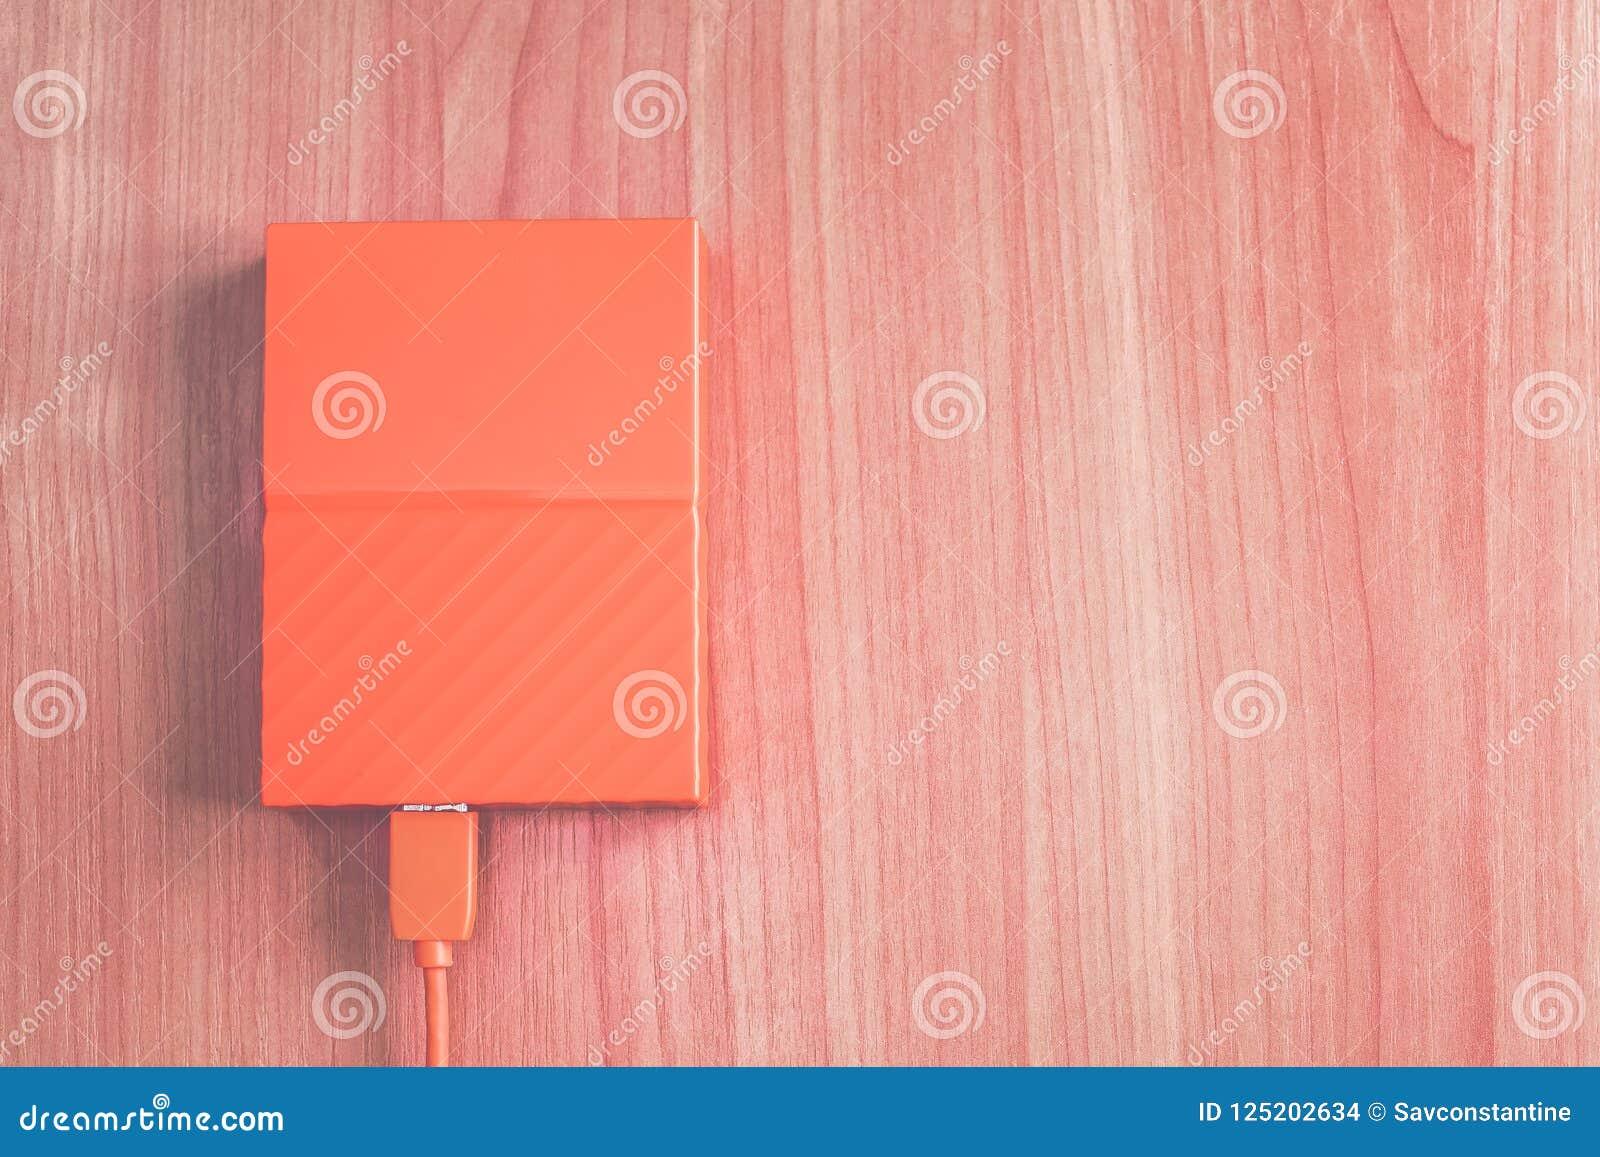 orange external hard drive